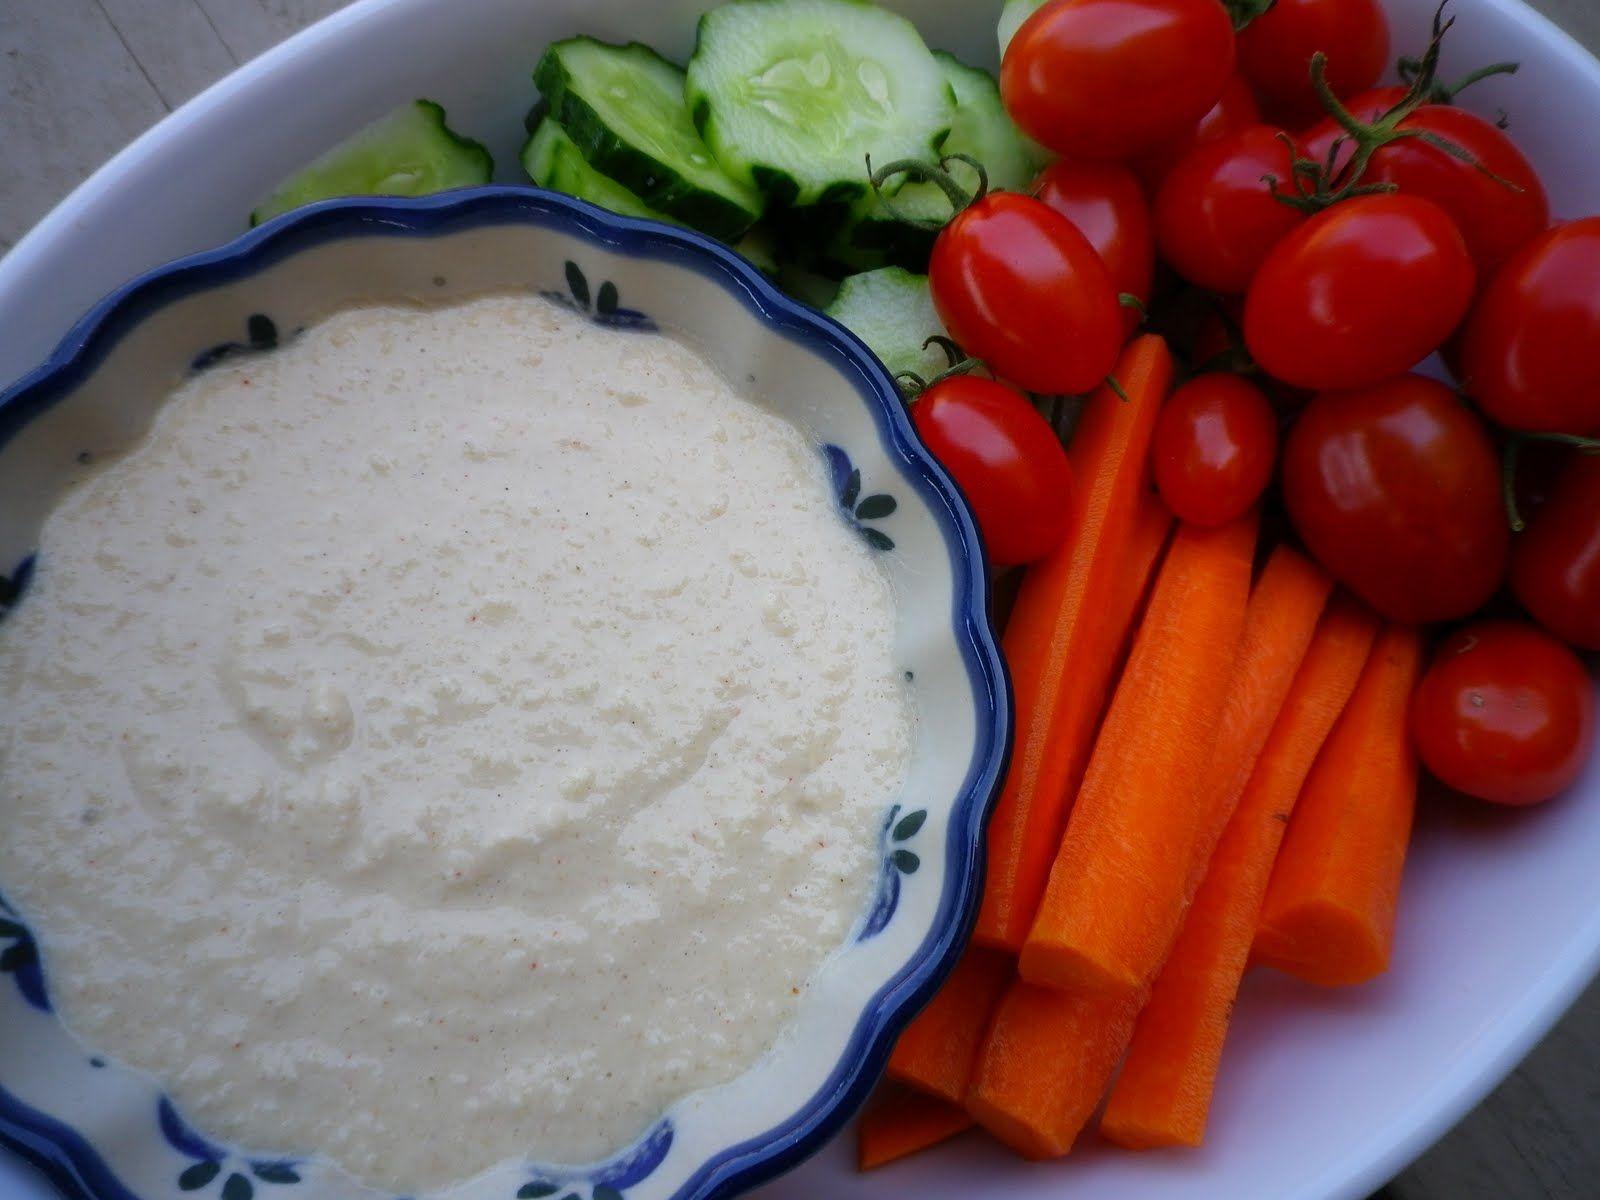 Zucchini hummus. Sub sesame oil for tahini